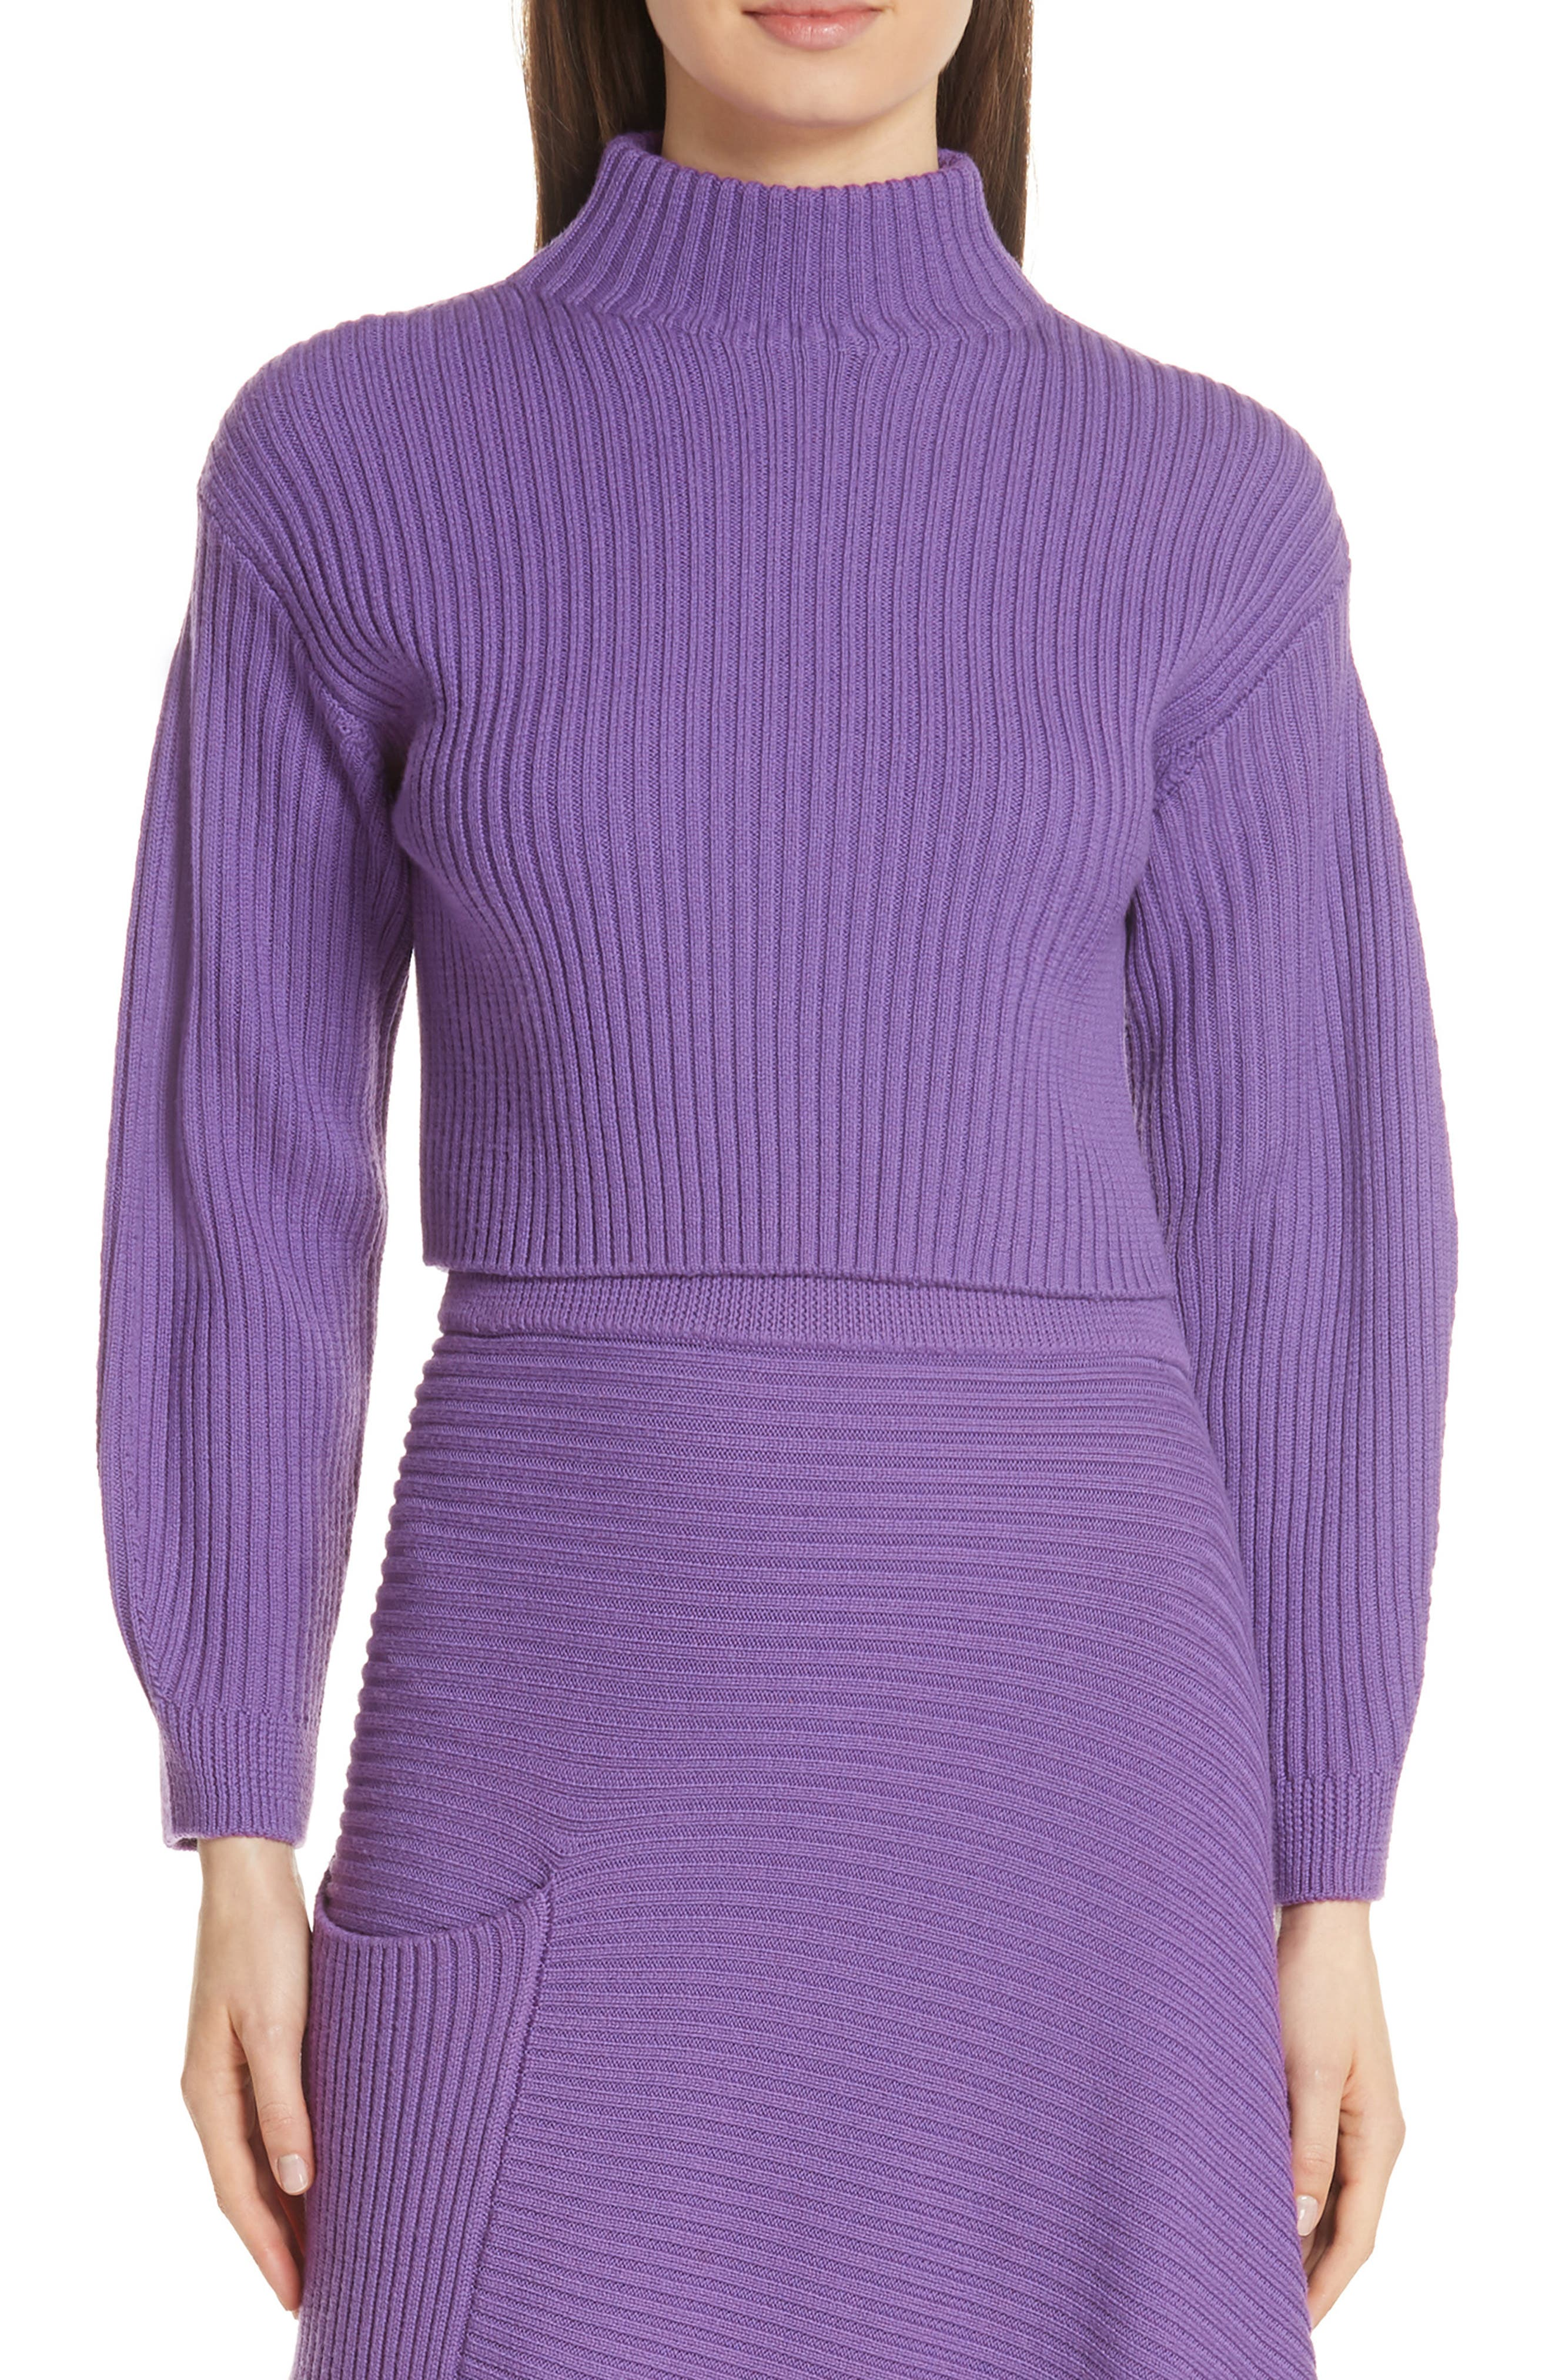 Tibi Structured Merino Wool Crop Sweater, Purple